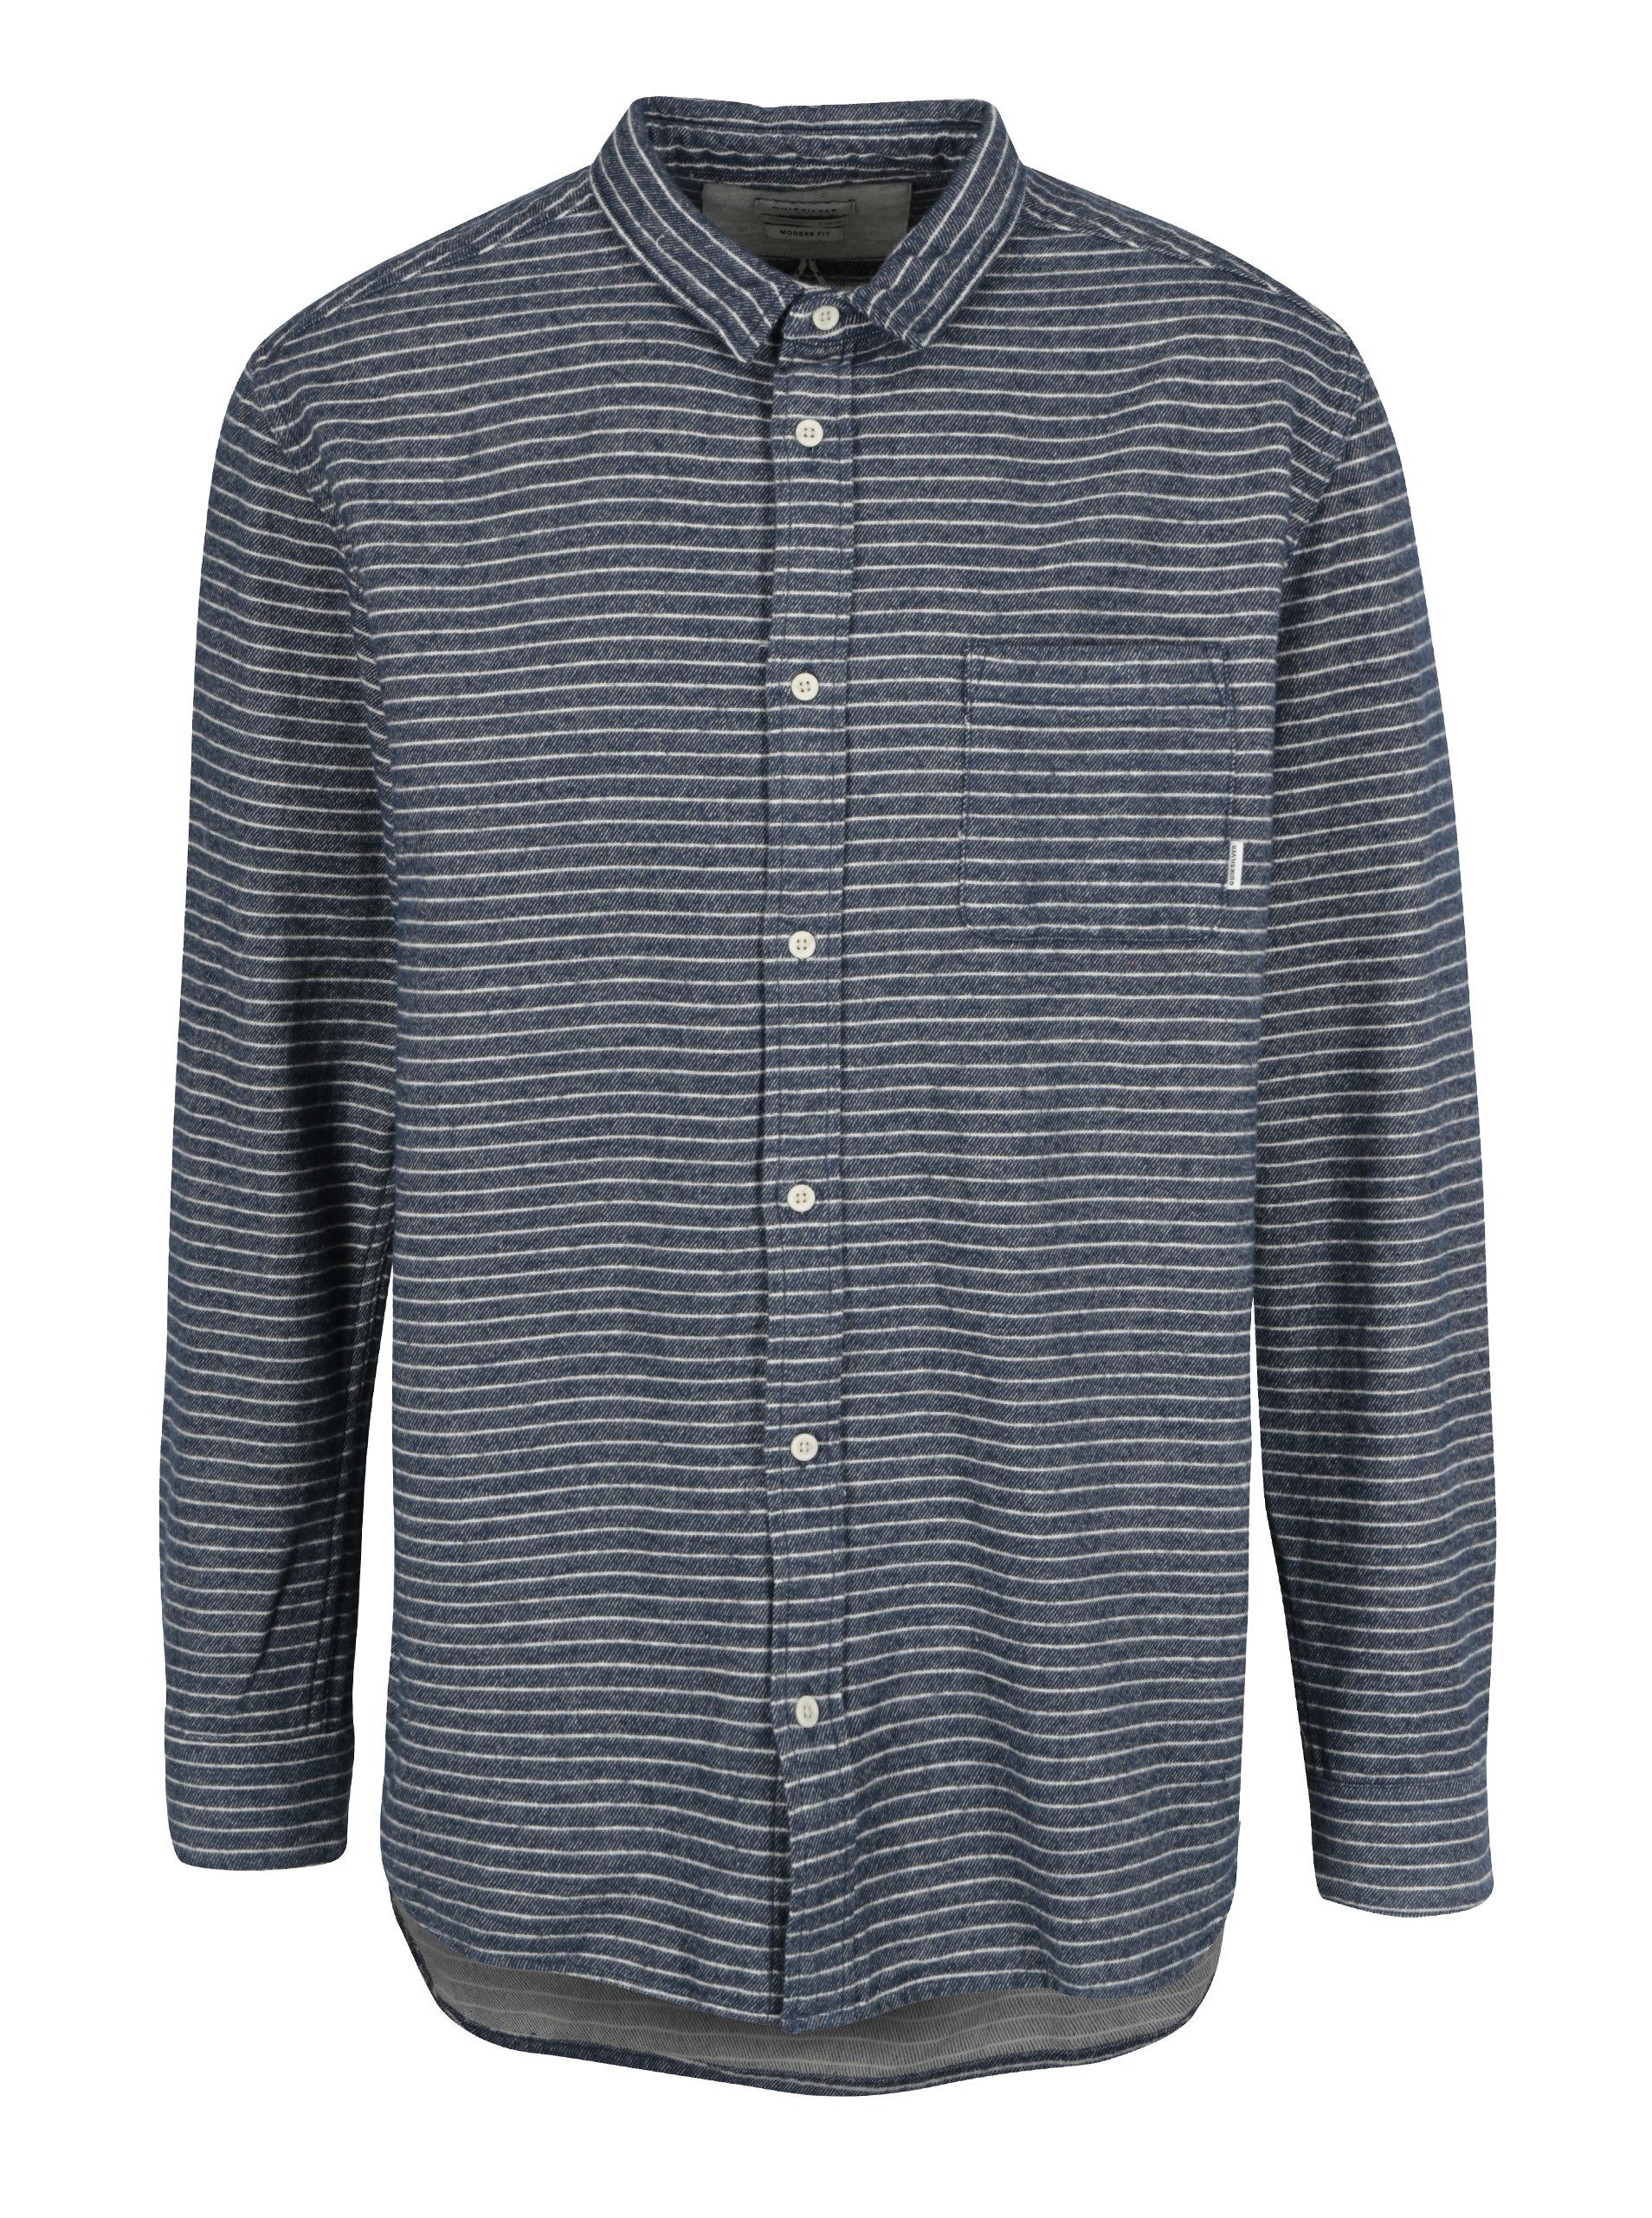 460c6867c8f9 Modrá pánska flanelová modern fit košeľa Quiksilver ...